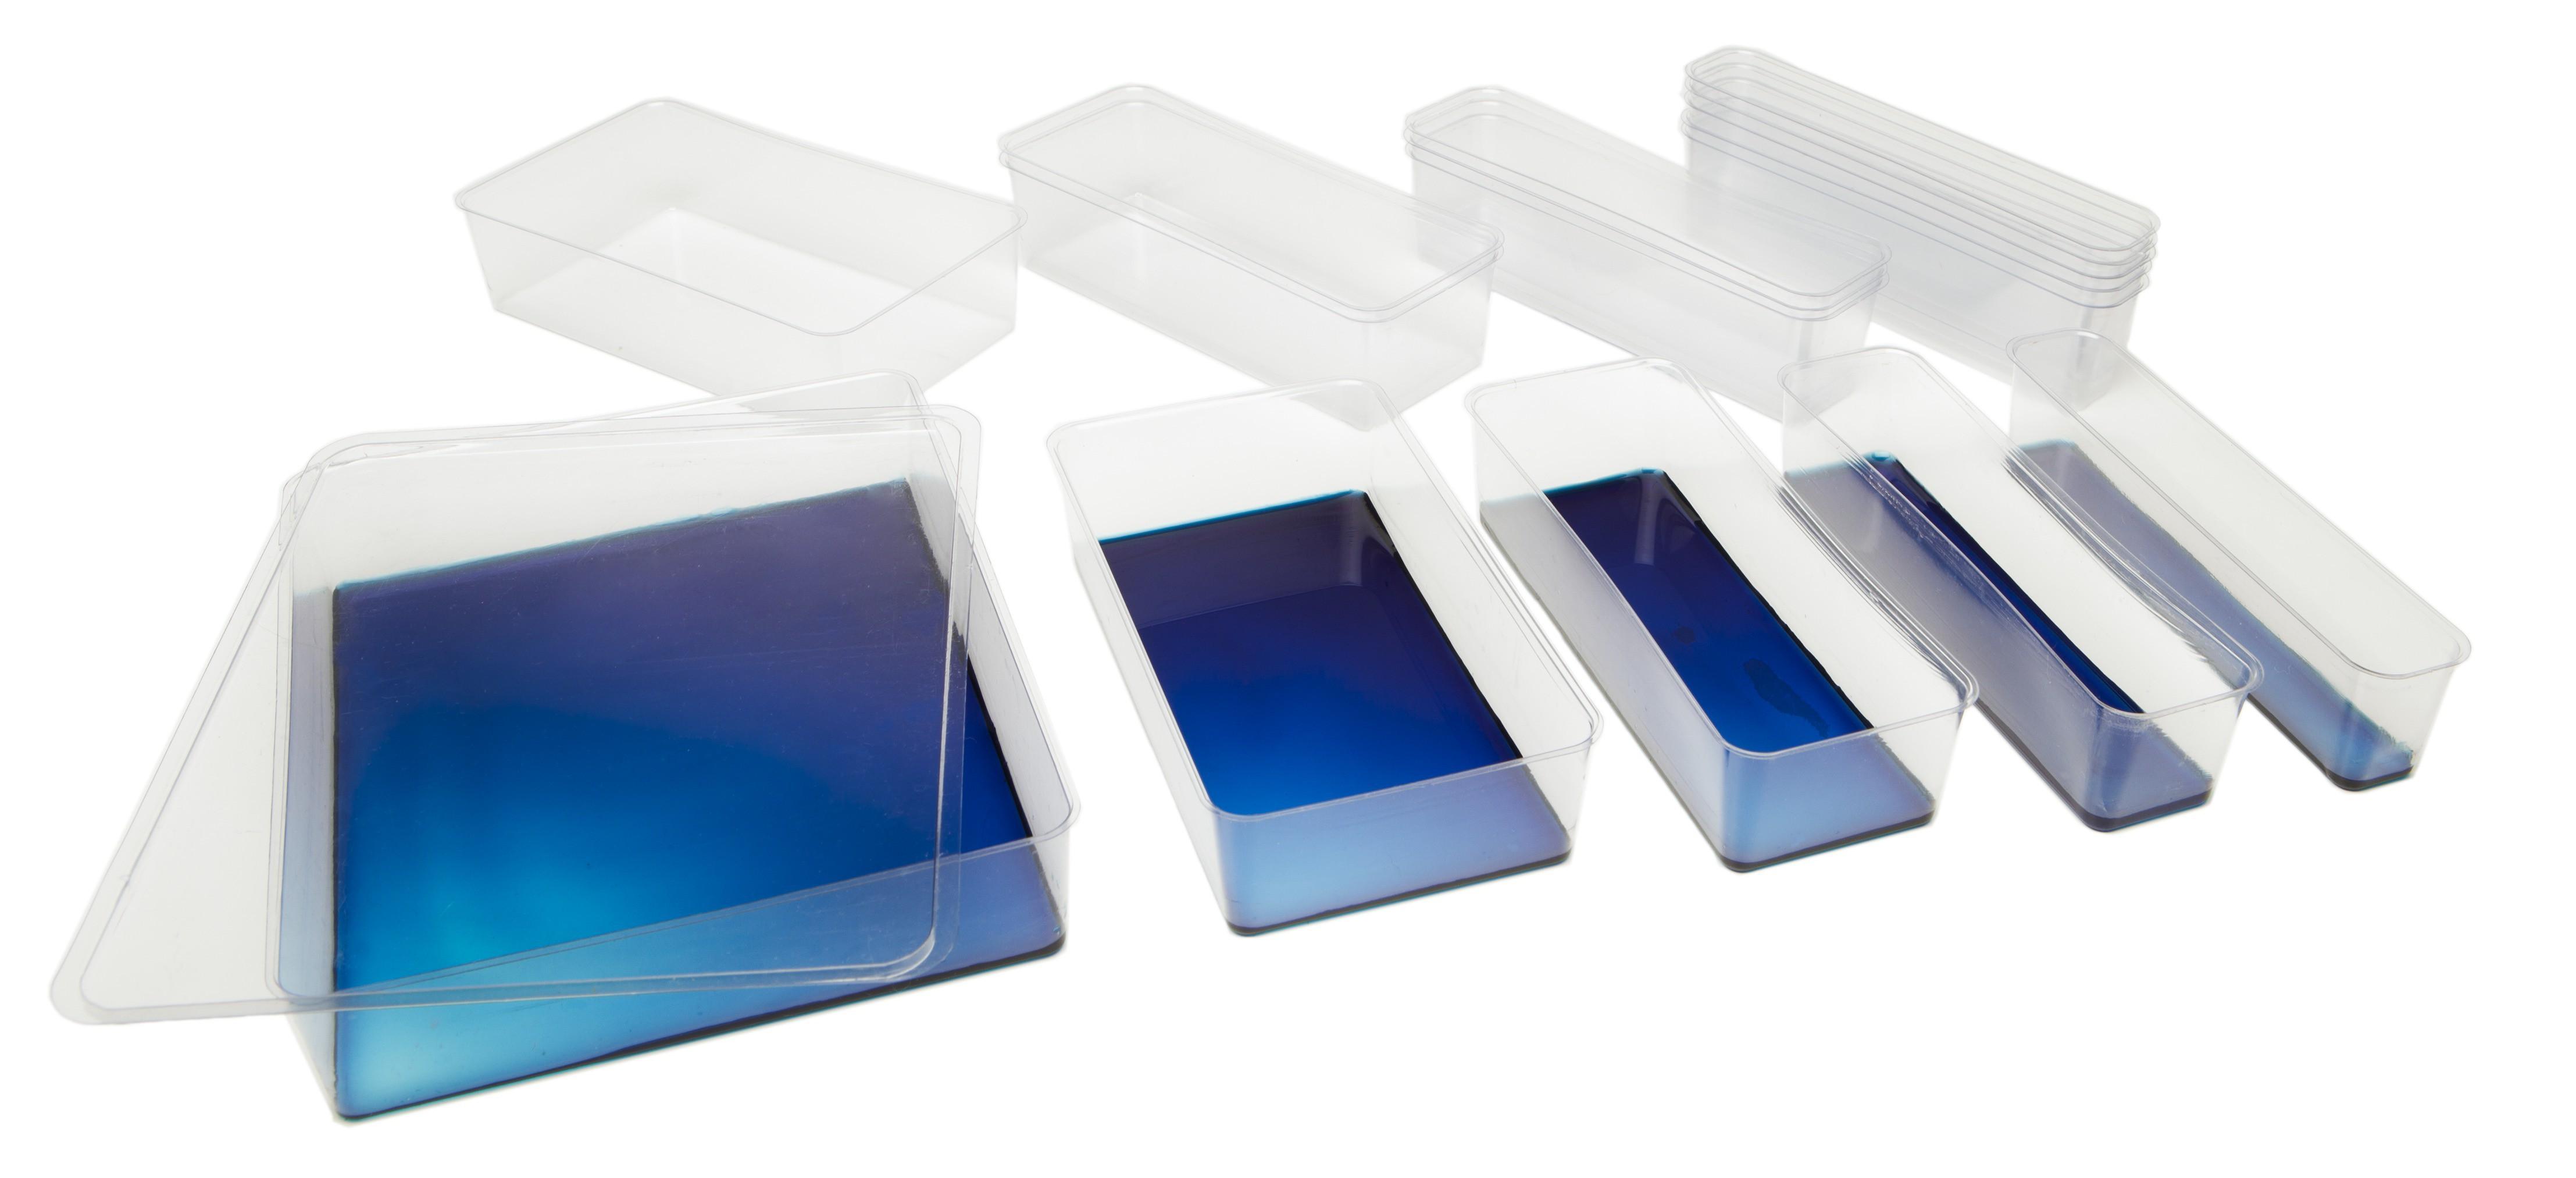 Bel-Art Antibody Saver Tray Sets, Disposable/Reusable Midi